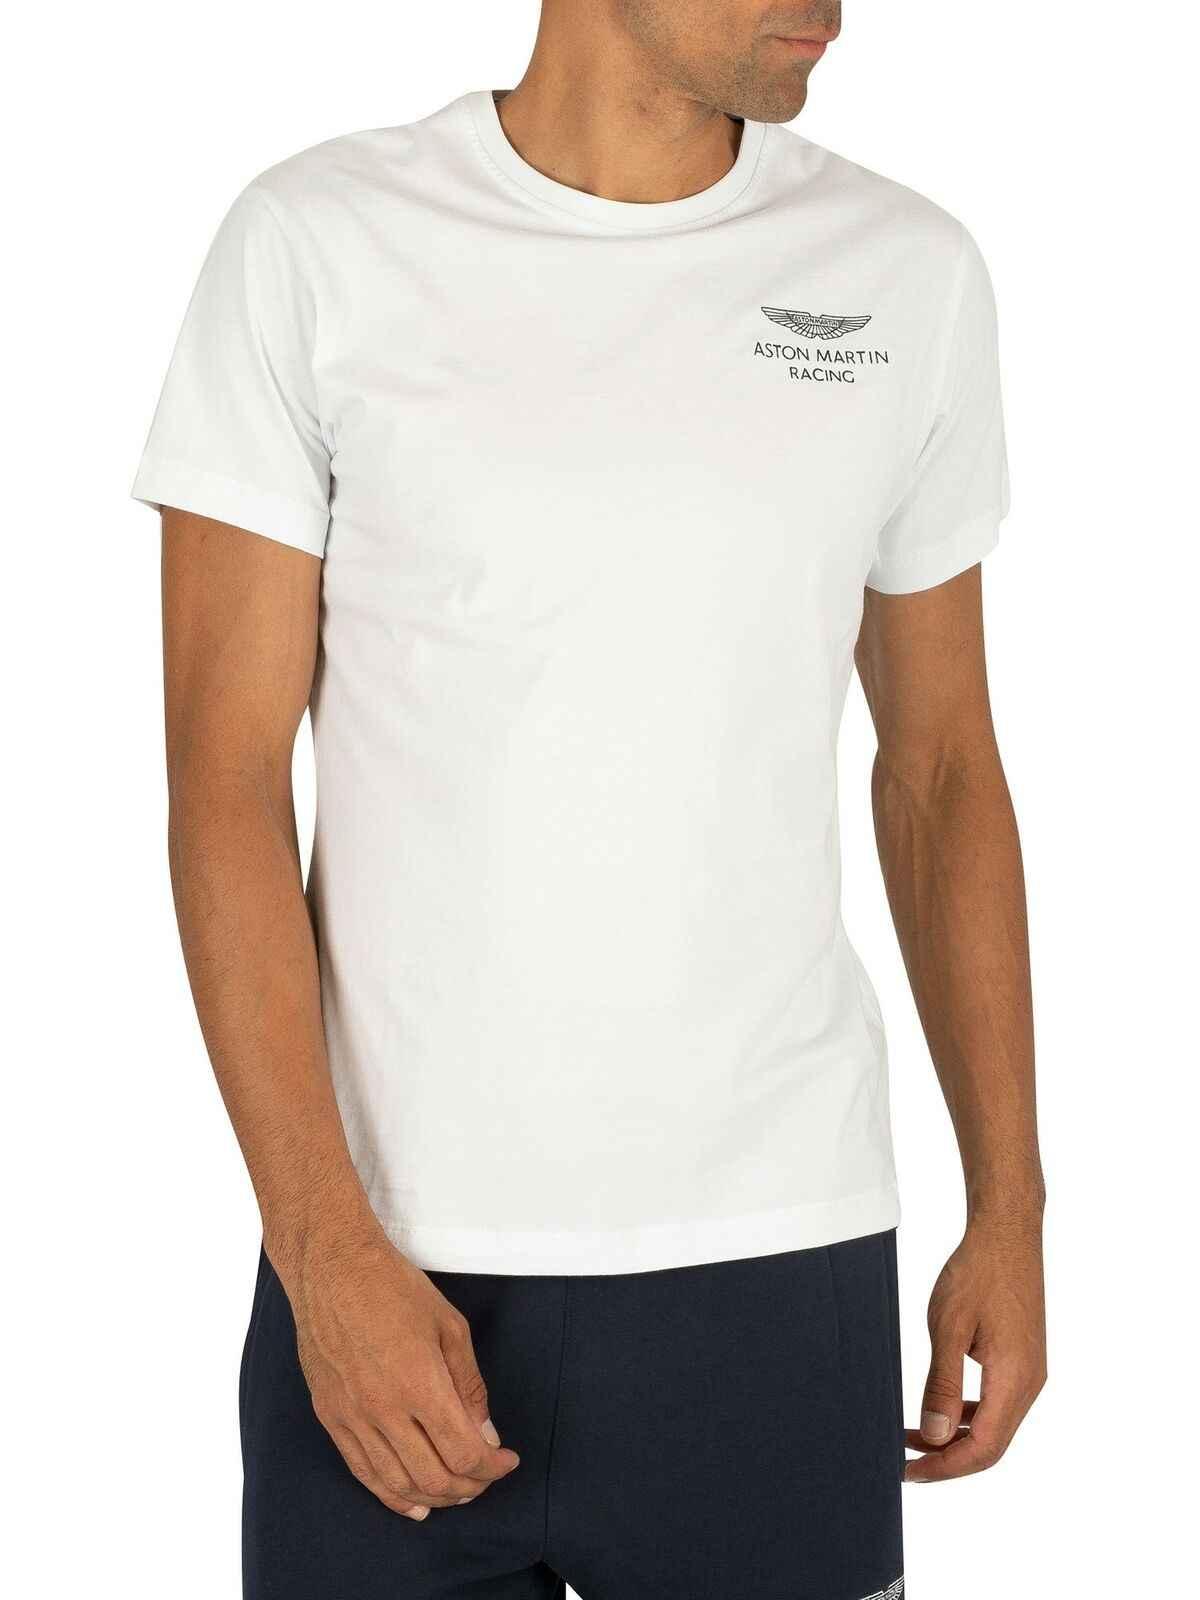 Футболка Hackett Men'S London Amr, белая футболка унисекс для гонок, размер S-3Xl